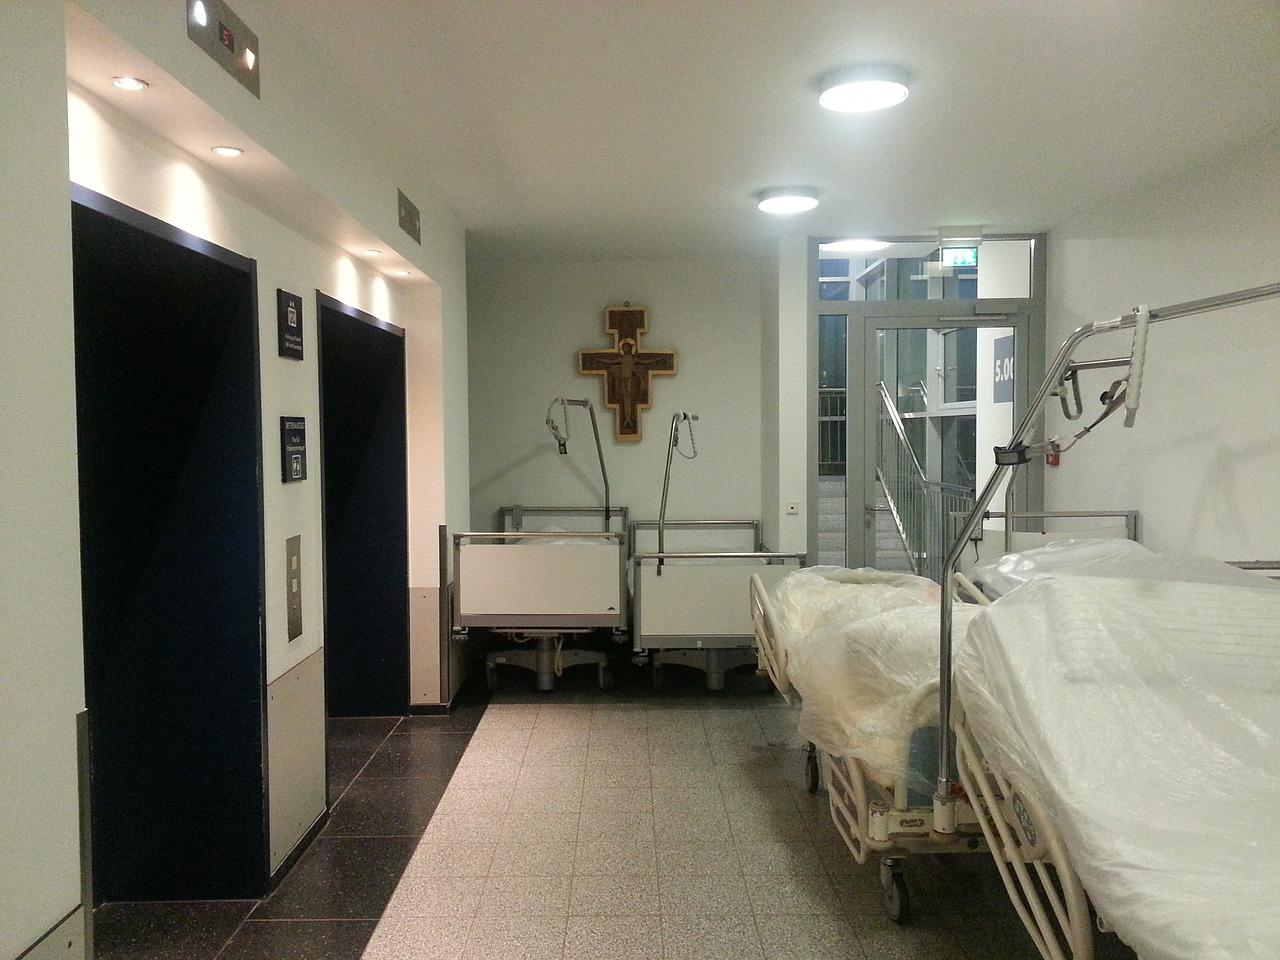 Ascensores para hospitales